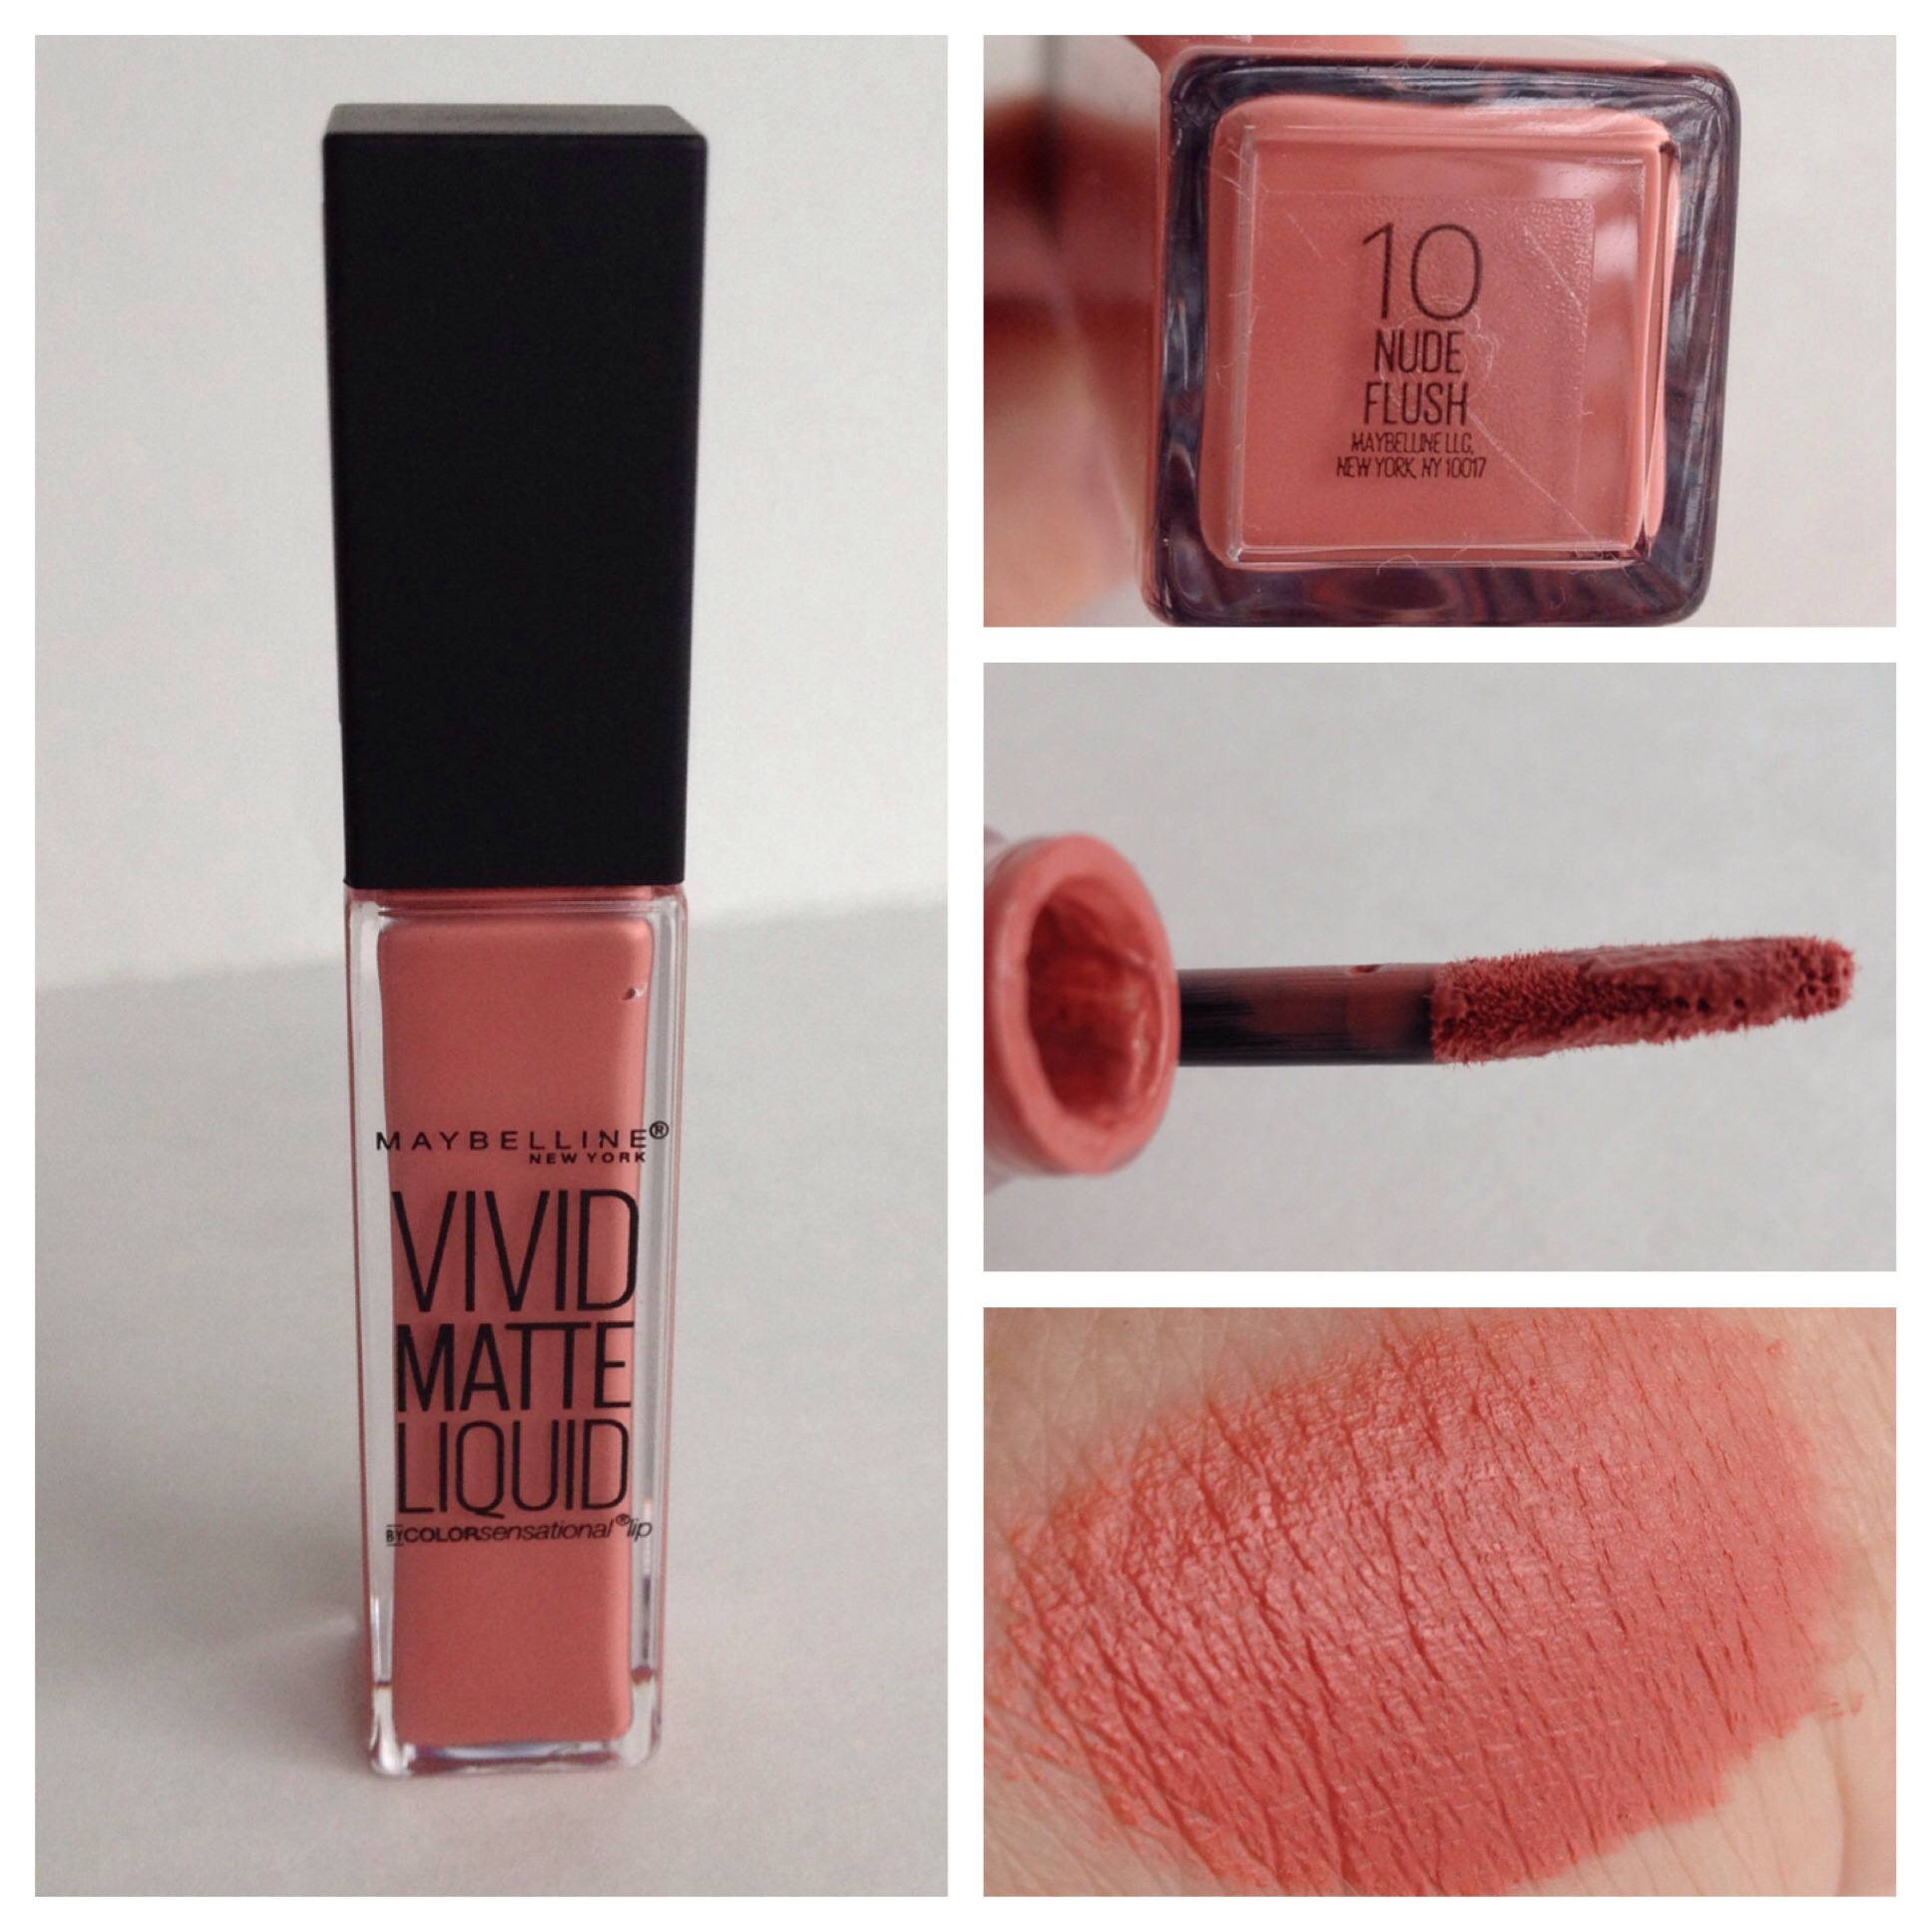 Maybelline Vivid Matte Liquid Reviews In Lipstick